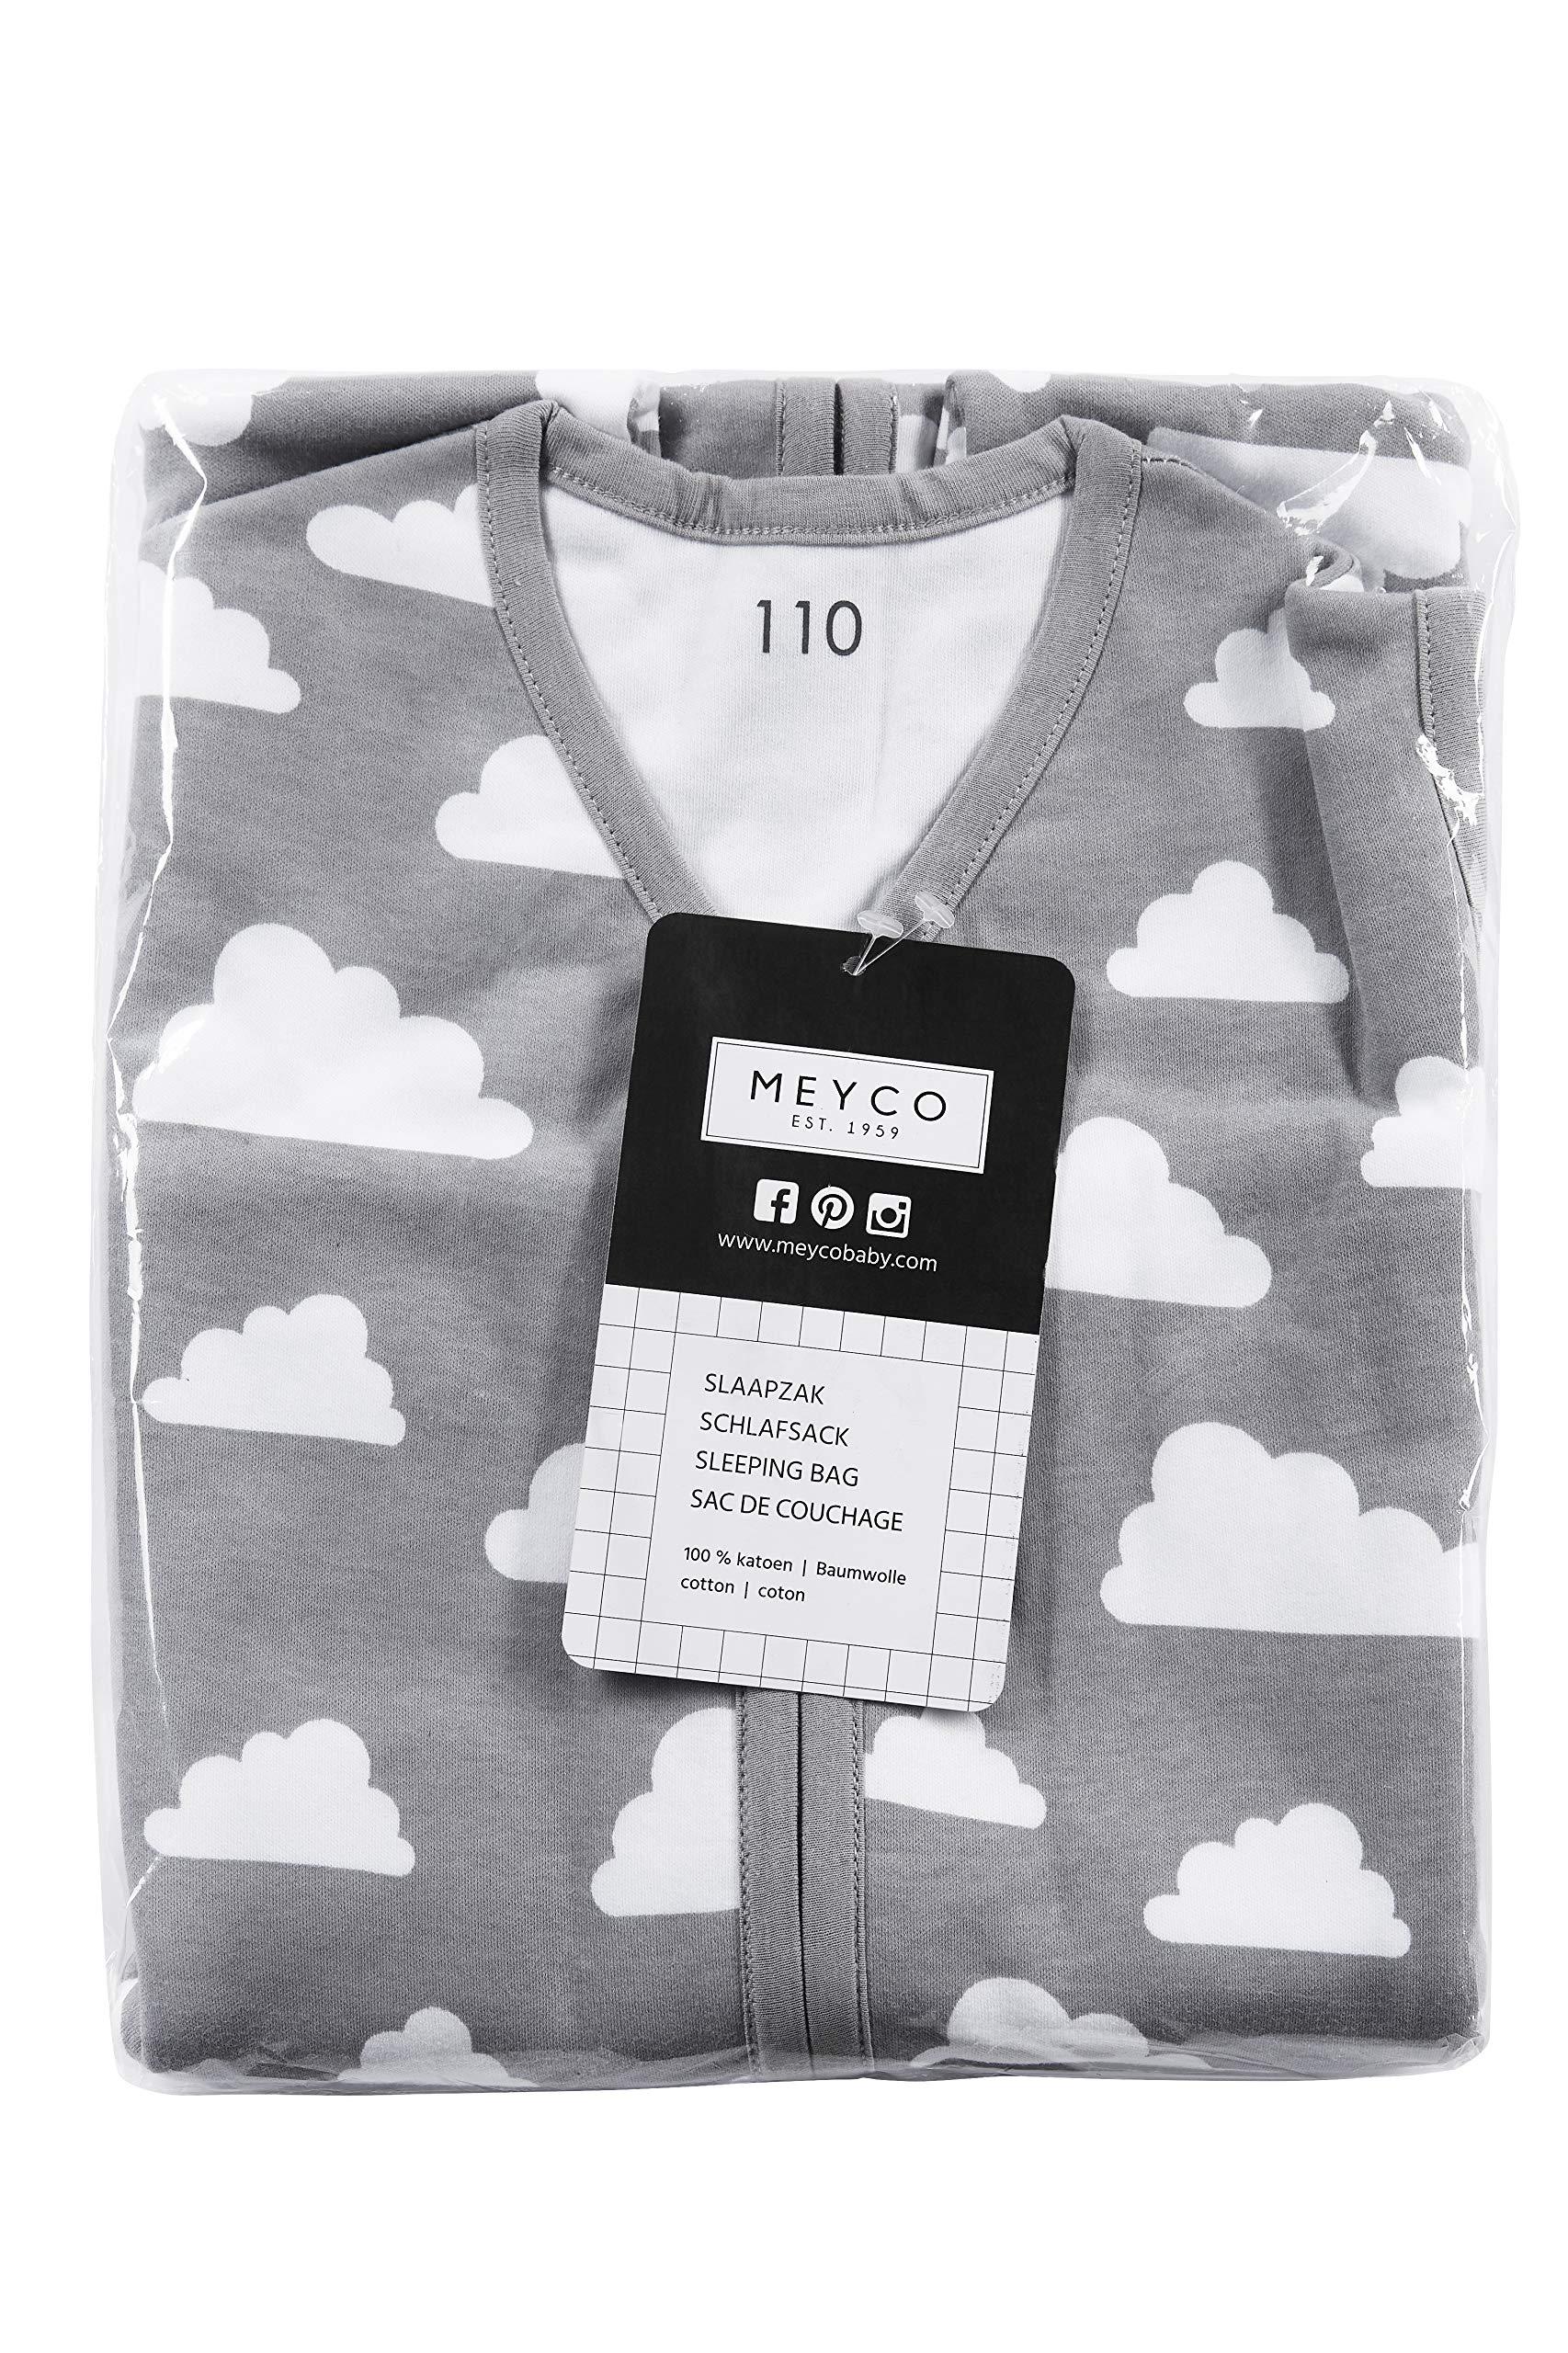 Meyco 512095Verano Saco de dormir 110cm, nubes gris